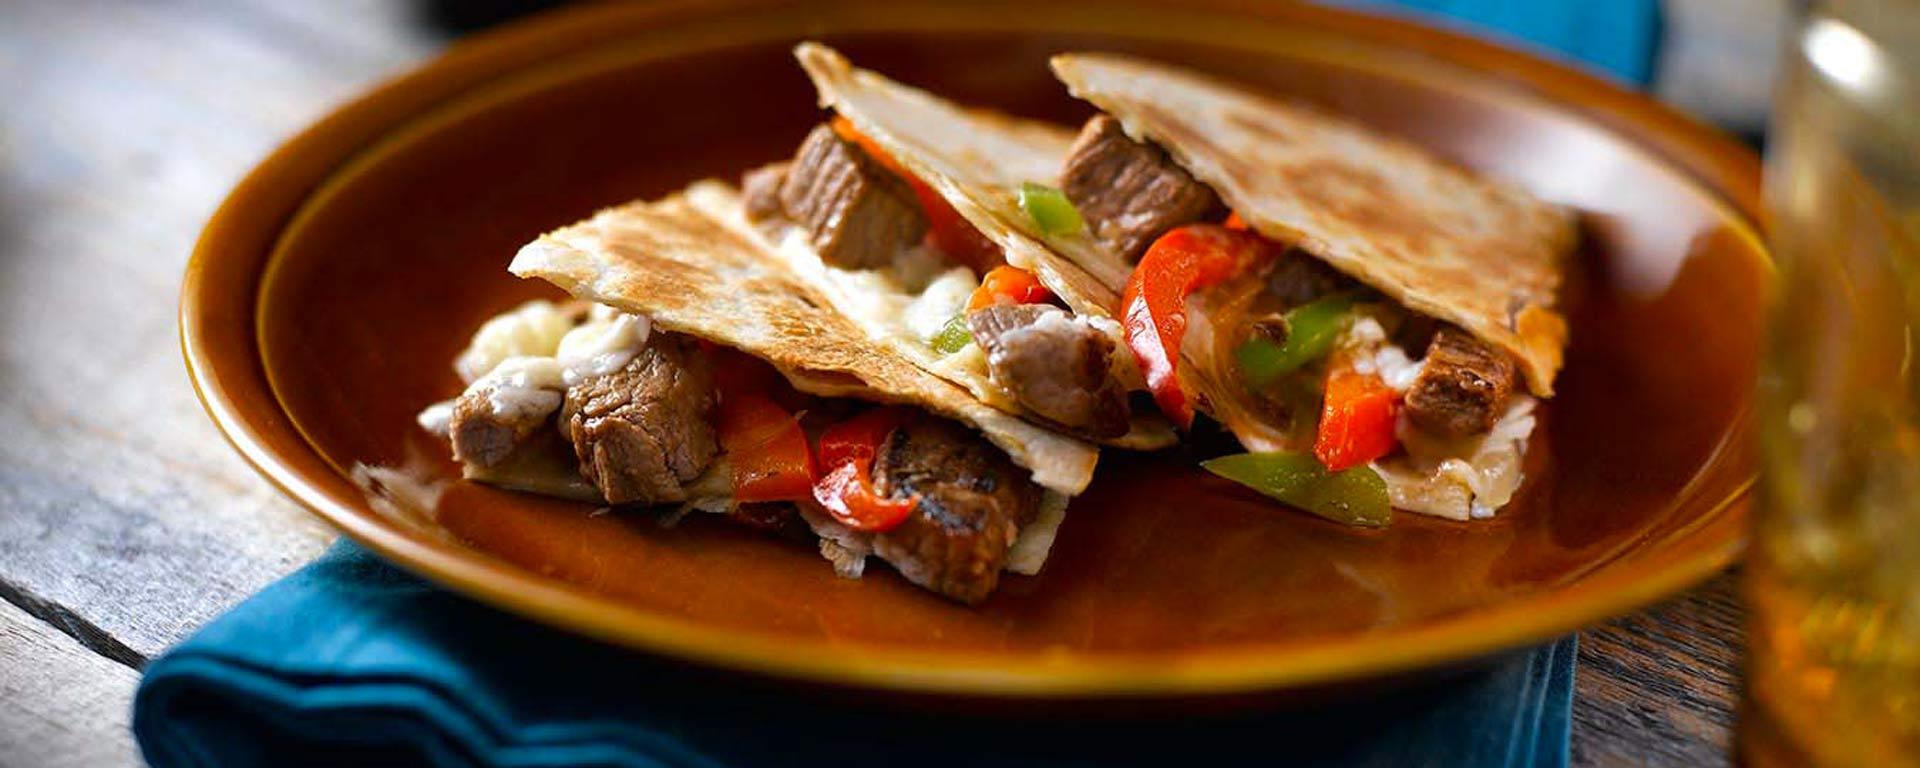 Photo for - Prairie Cheesesteak Quesadillas